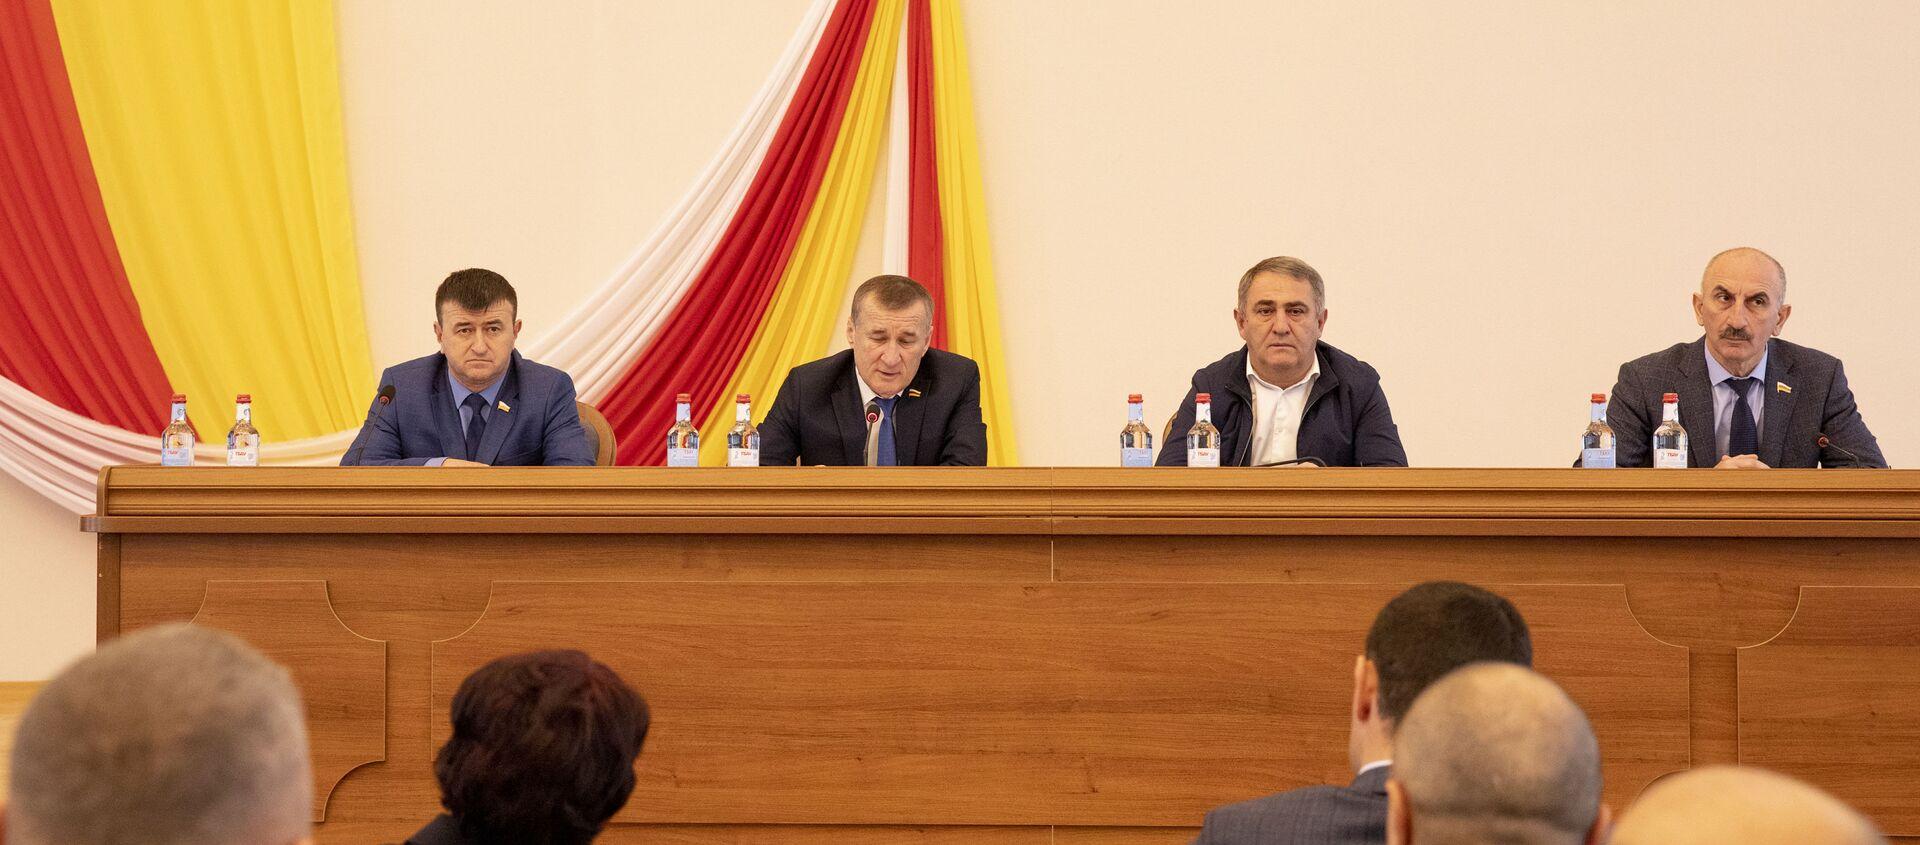 Сессия Парламента РЮО - Sputnik Южная Осетия, 1920, 14.07.2021